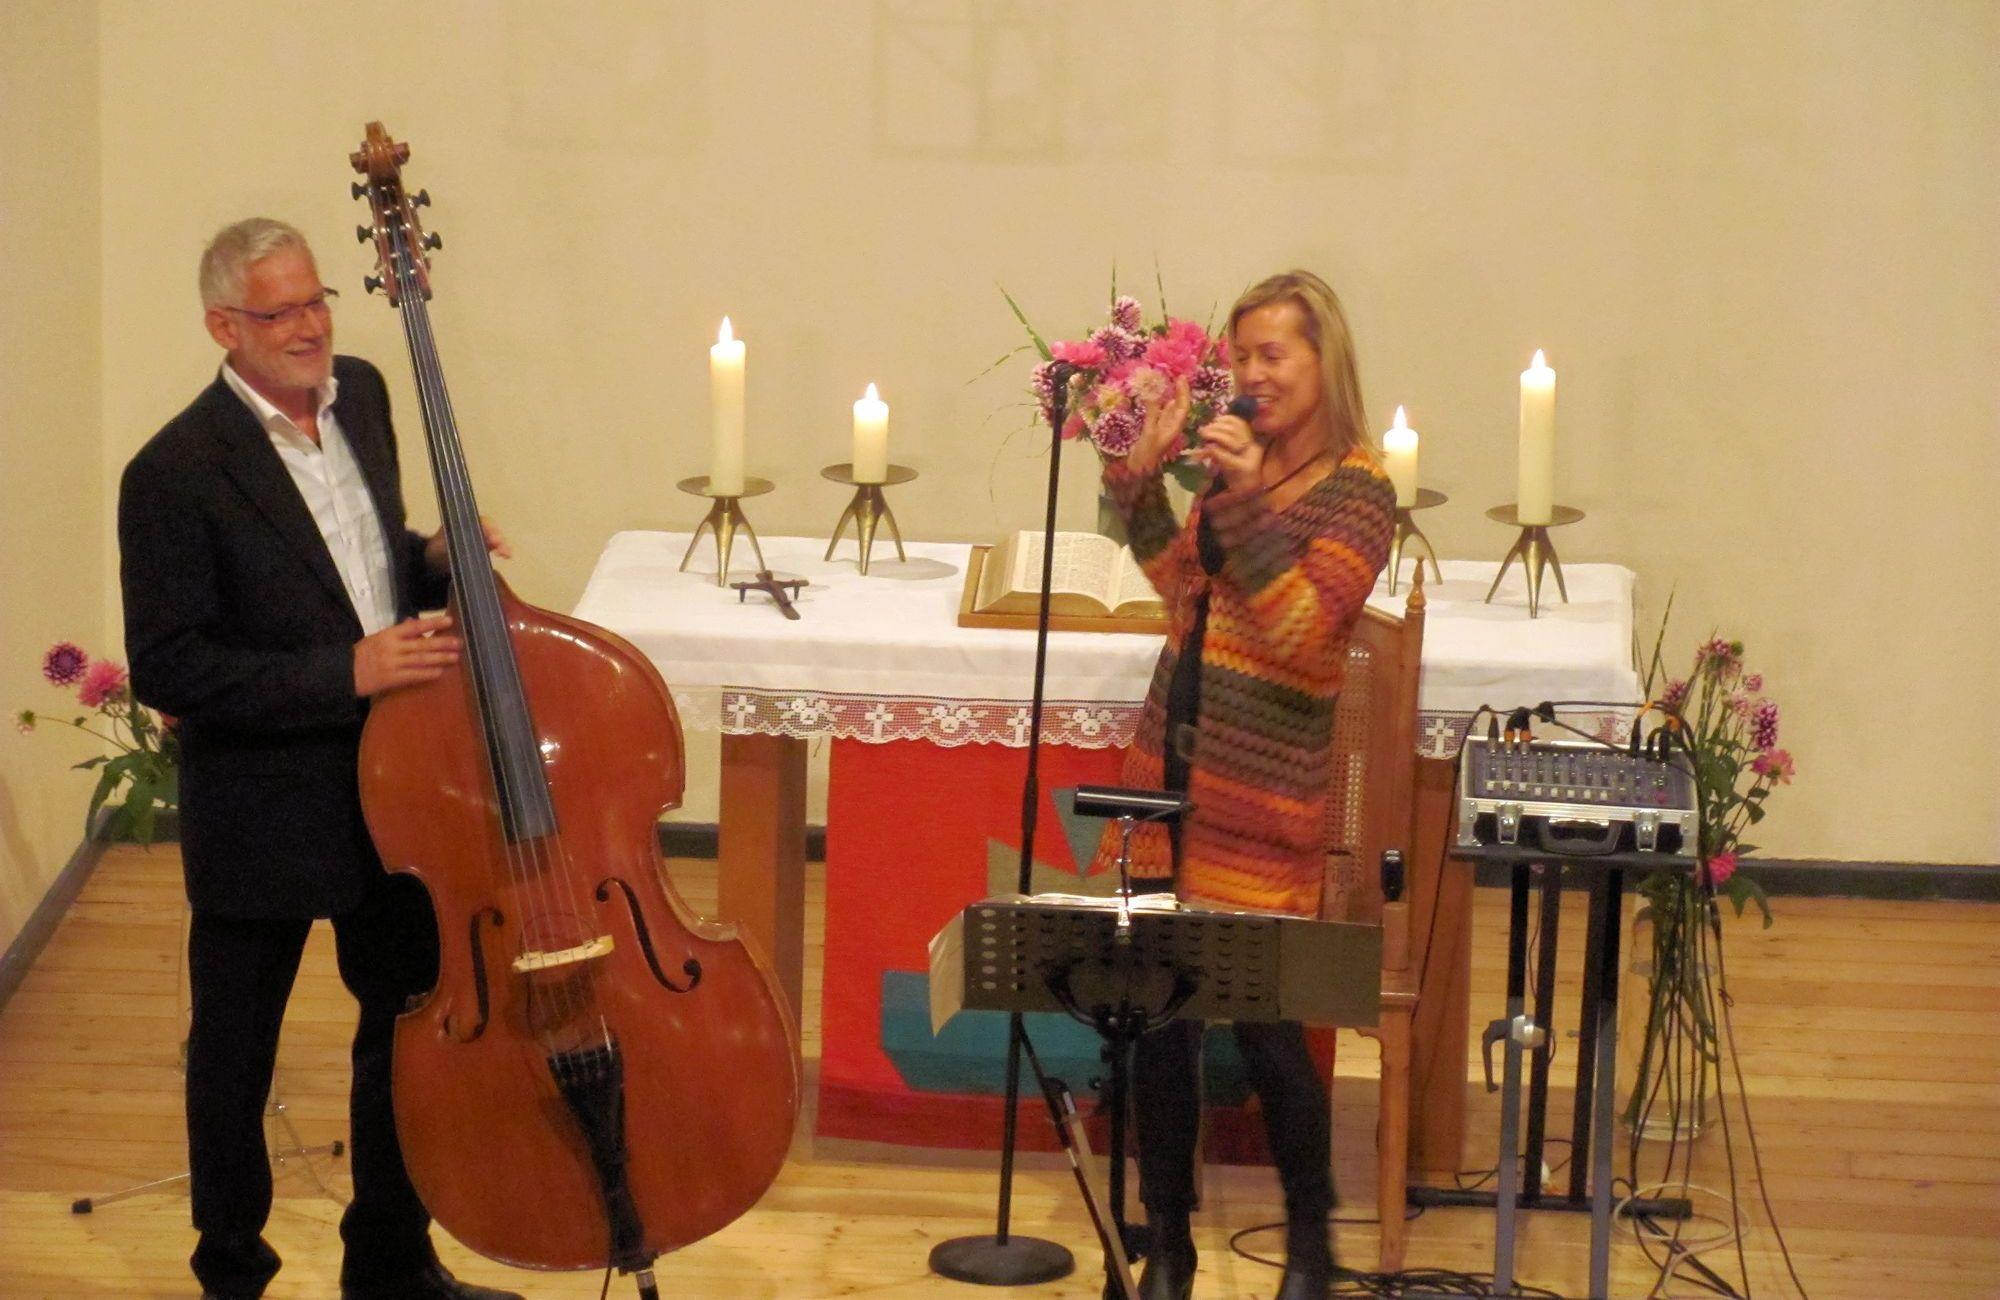 Susan Feel Good (Susanna Trinkaus & Bernhard Rosendahl)